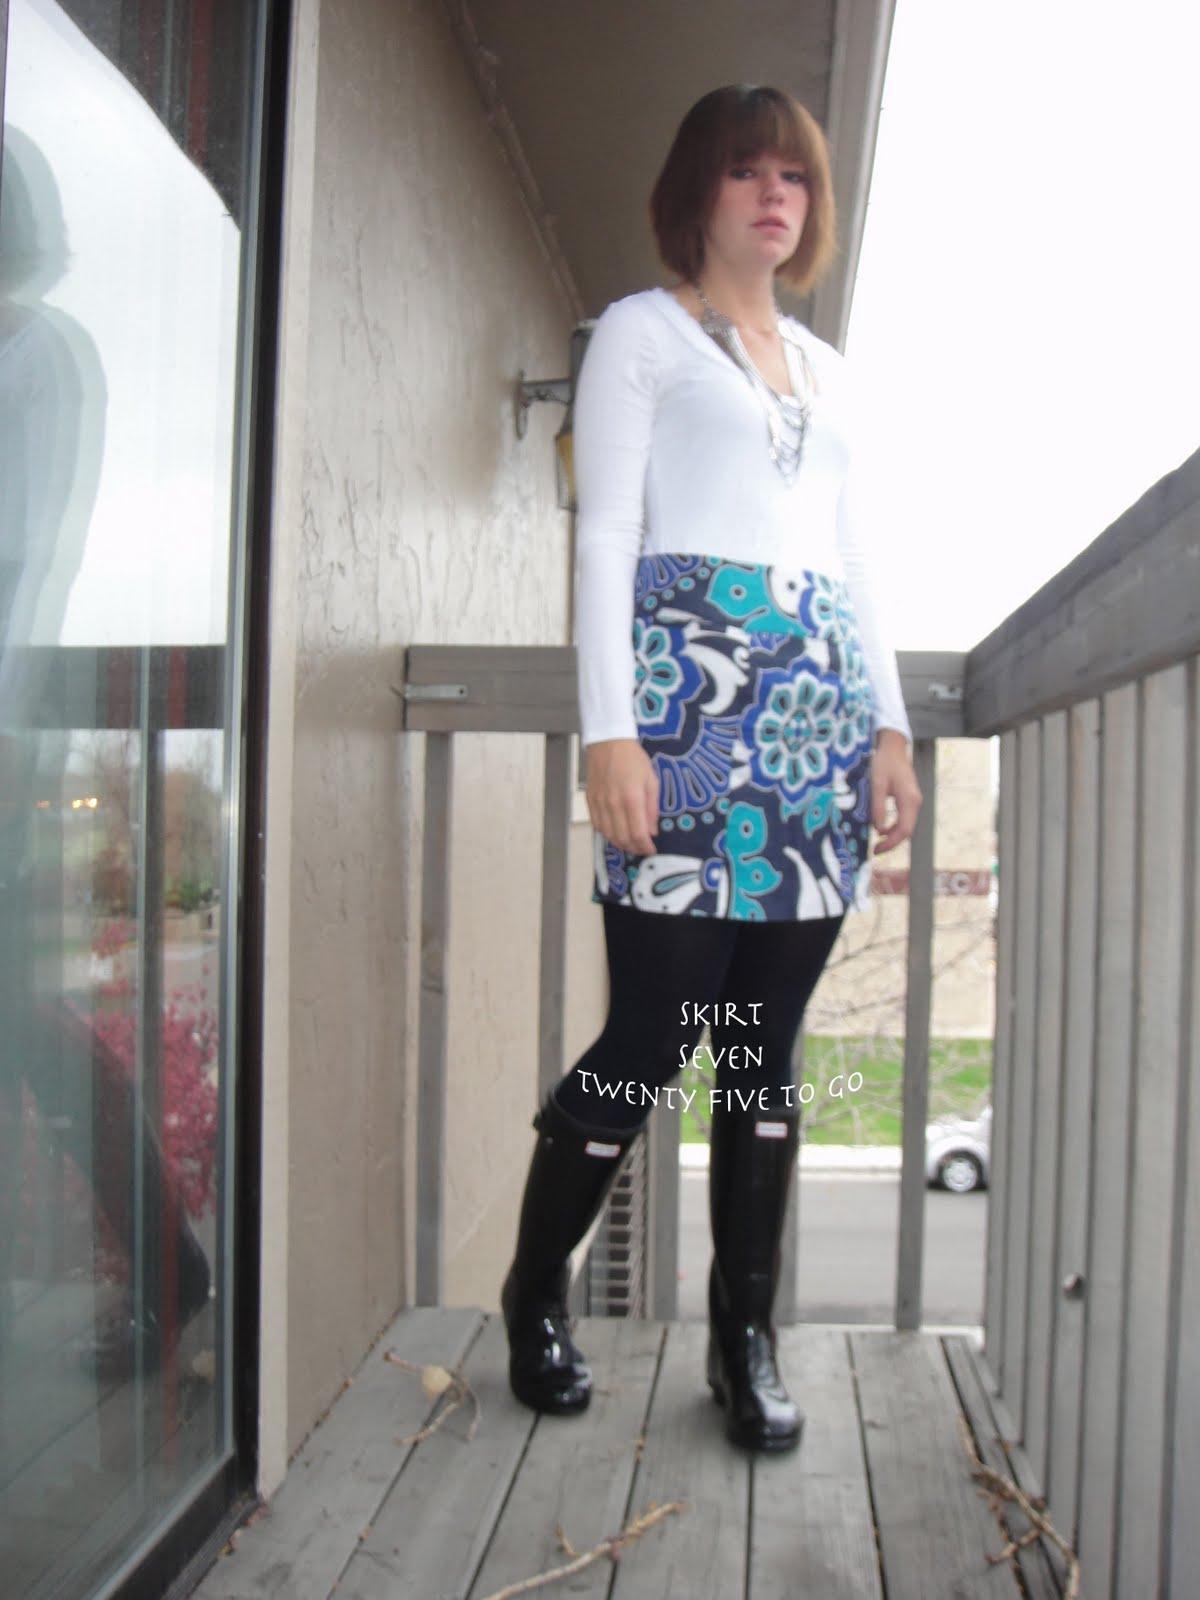 http://3.bp.blogspot.com/-7Zr4W6PJryY/TbSvBlD52zI/AAAAAAAAAFE/ATu8bq_o9KY/s1600/DSC00446.jpg